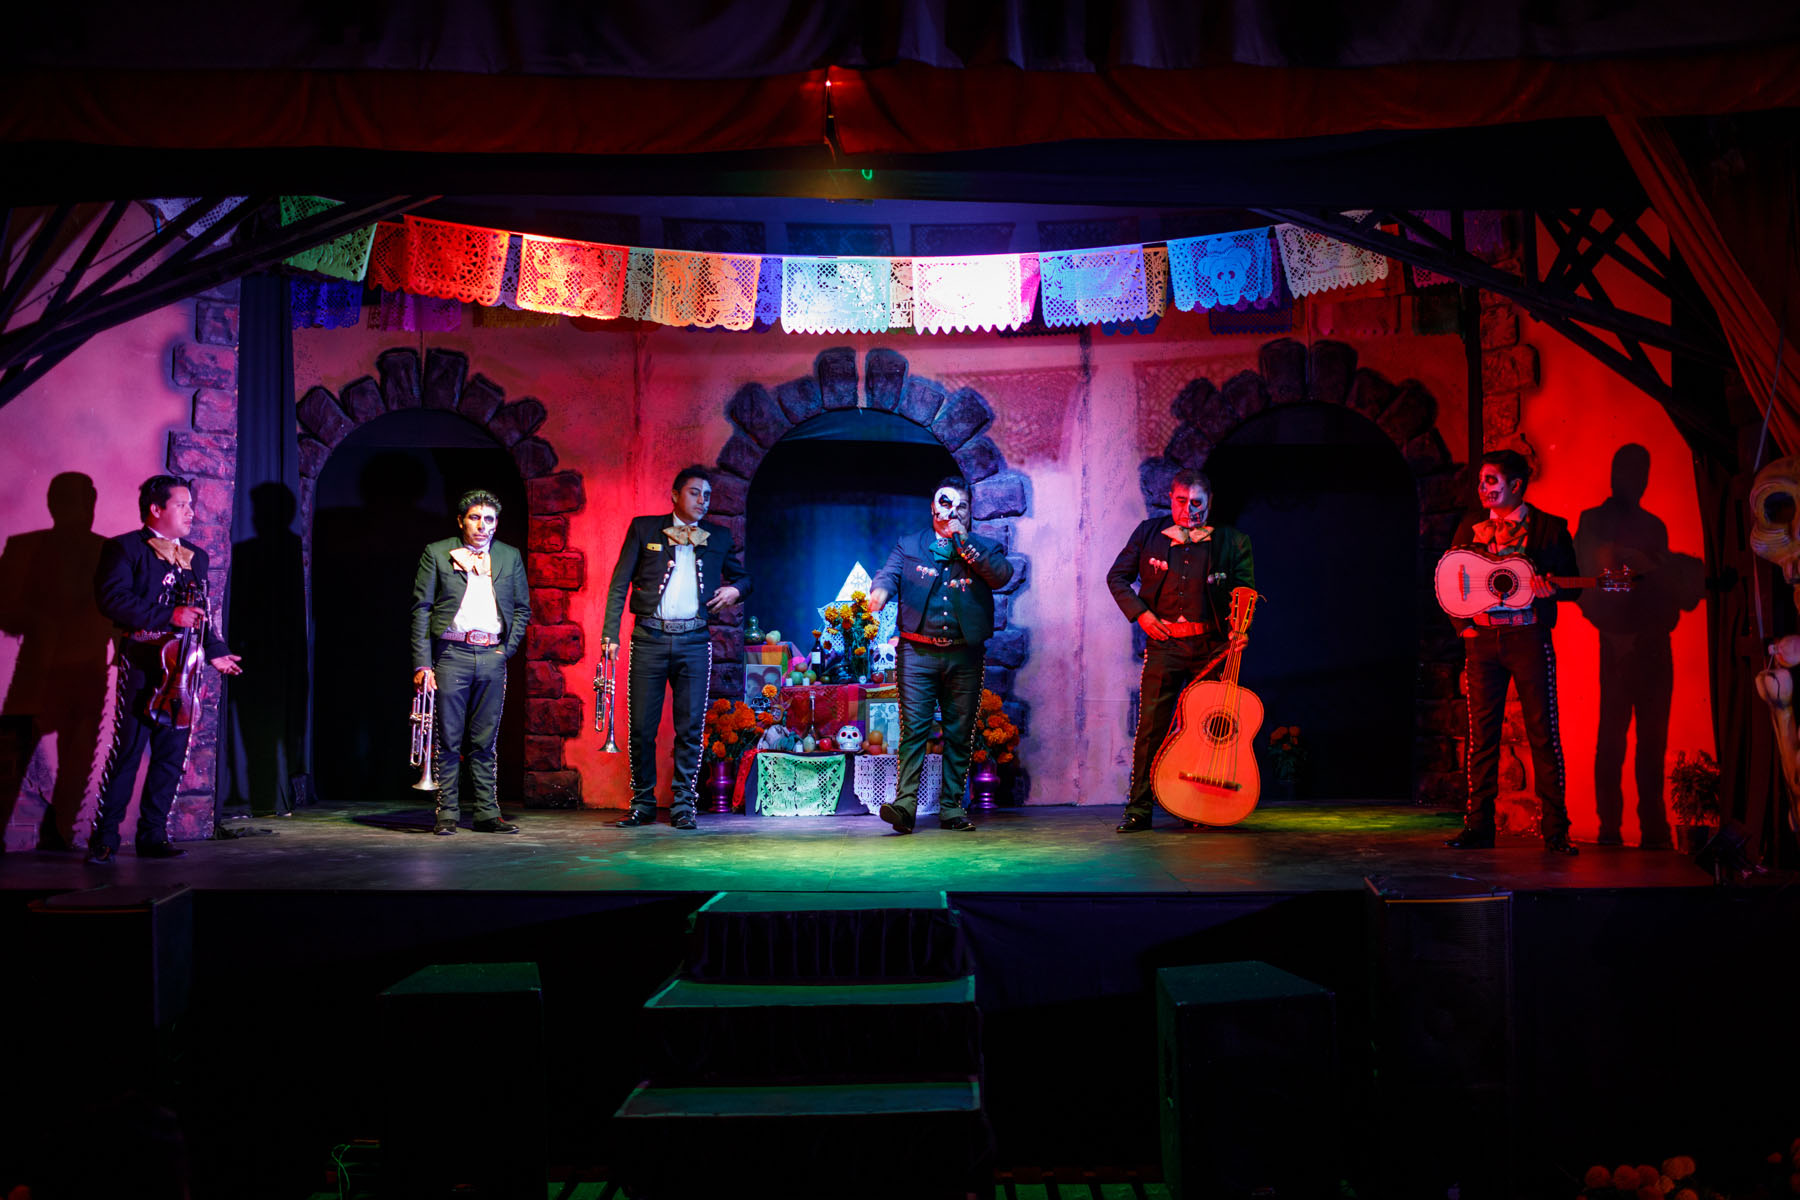 La Catrina en Trajinera Mexico City // Notjessfashion.com